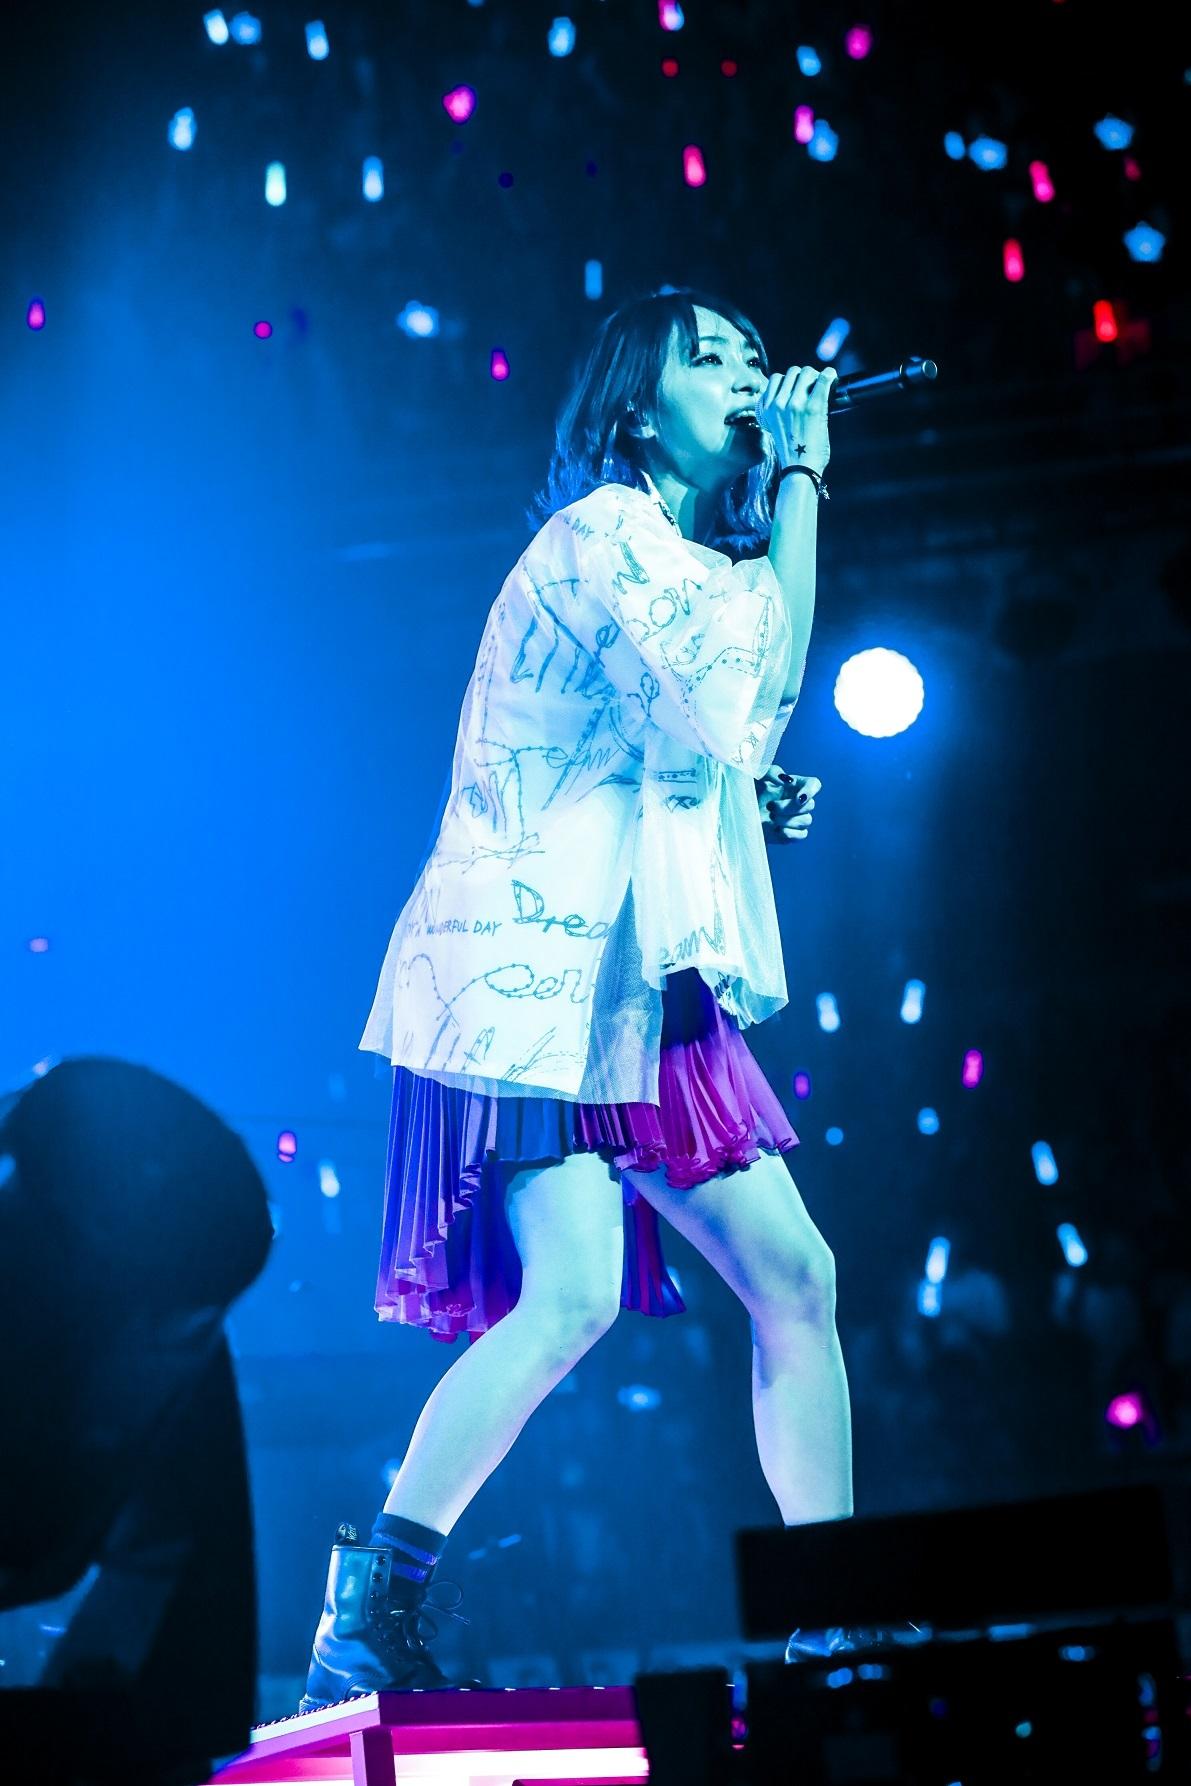 LiSA photo by hajime kamiiisaka